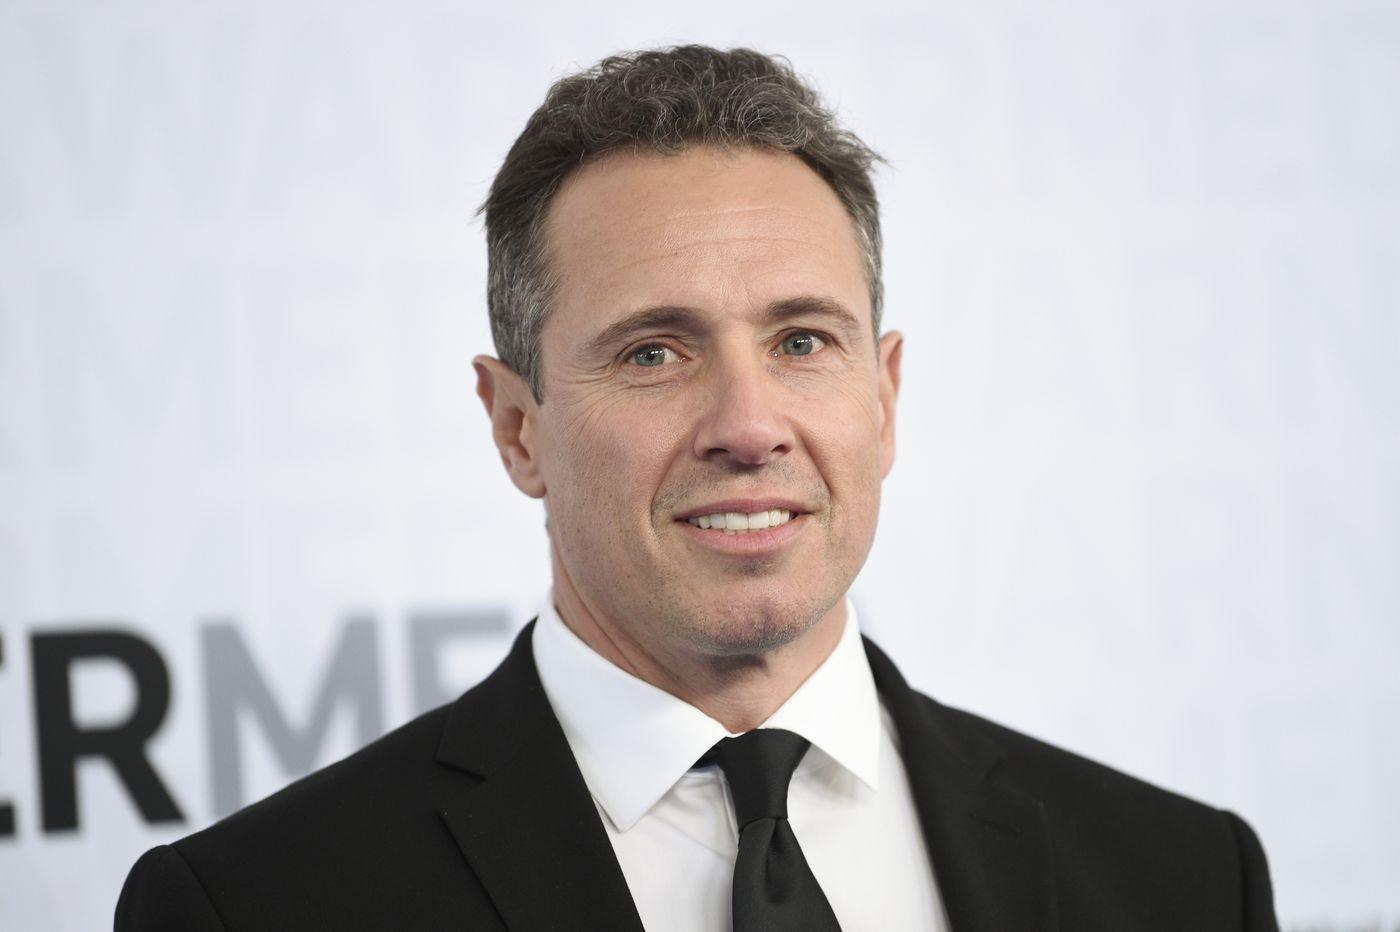 CNN's Cuomo says he has coronavirus, has shown symptoms